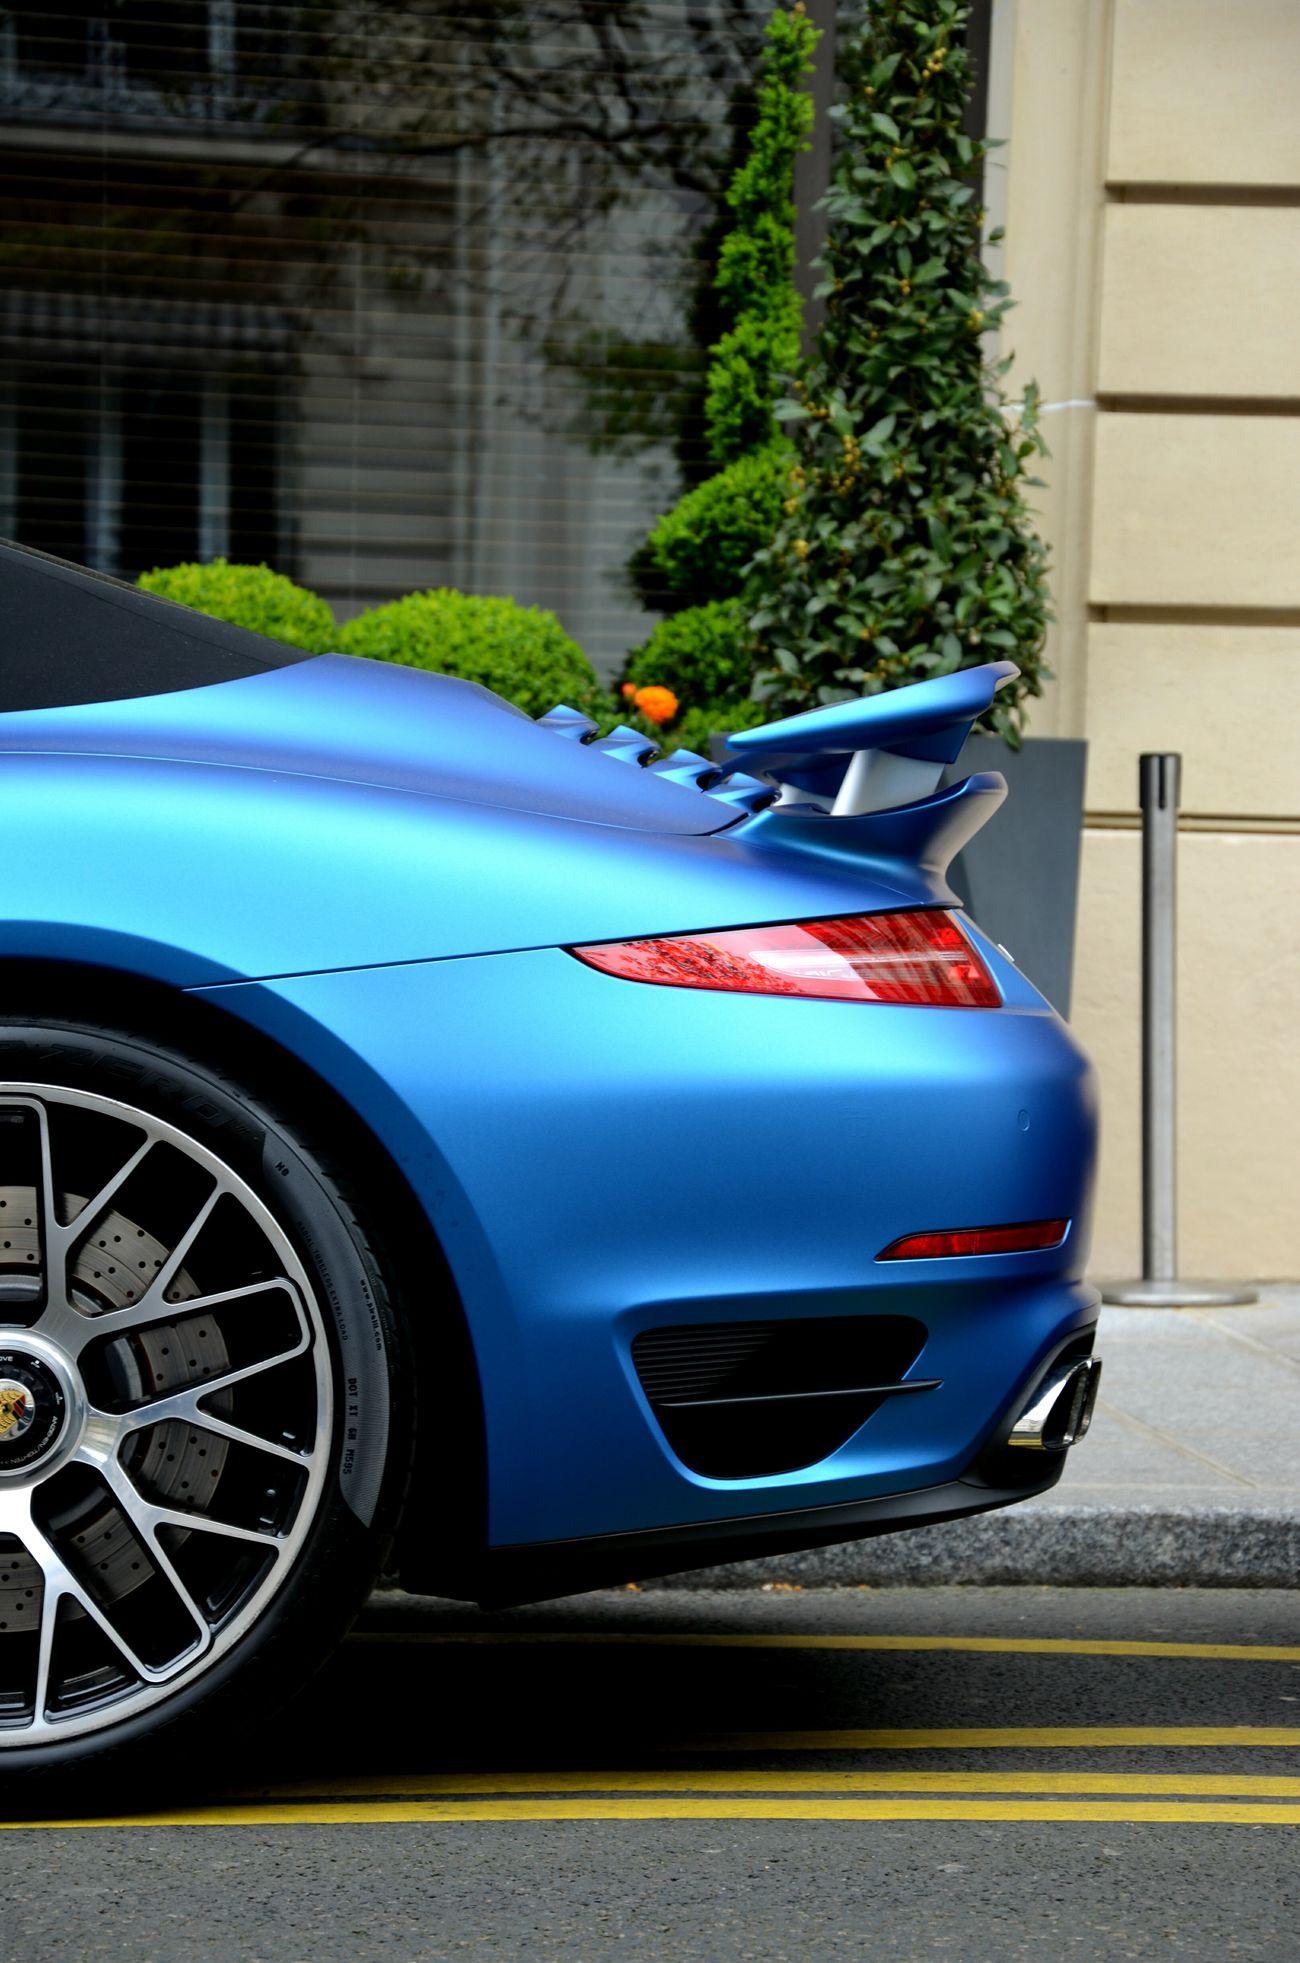 Porsche Carrera 911 S Cabriolet. Paris. 11.04.15 Porsche Carrera 911 Paris Carspotting D5100 Nikon Carphotography